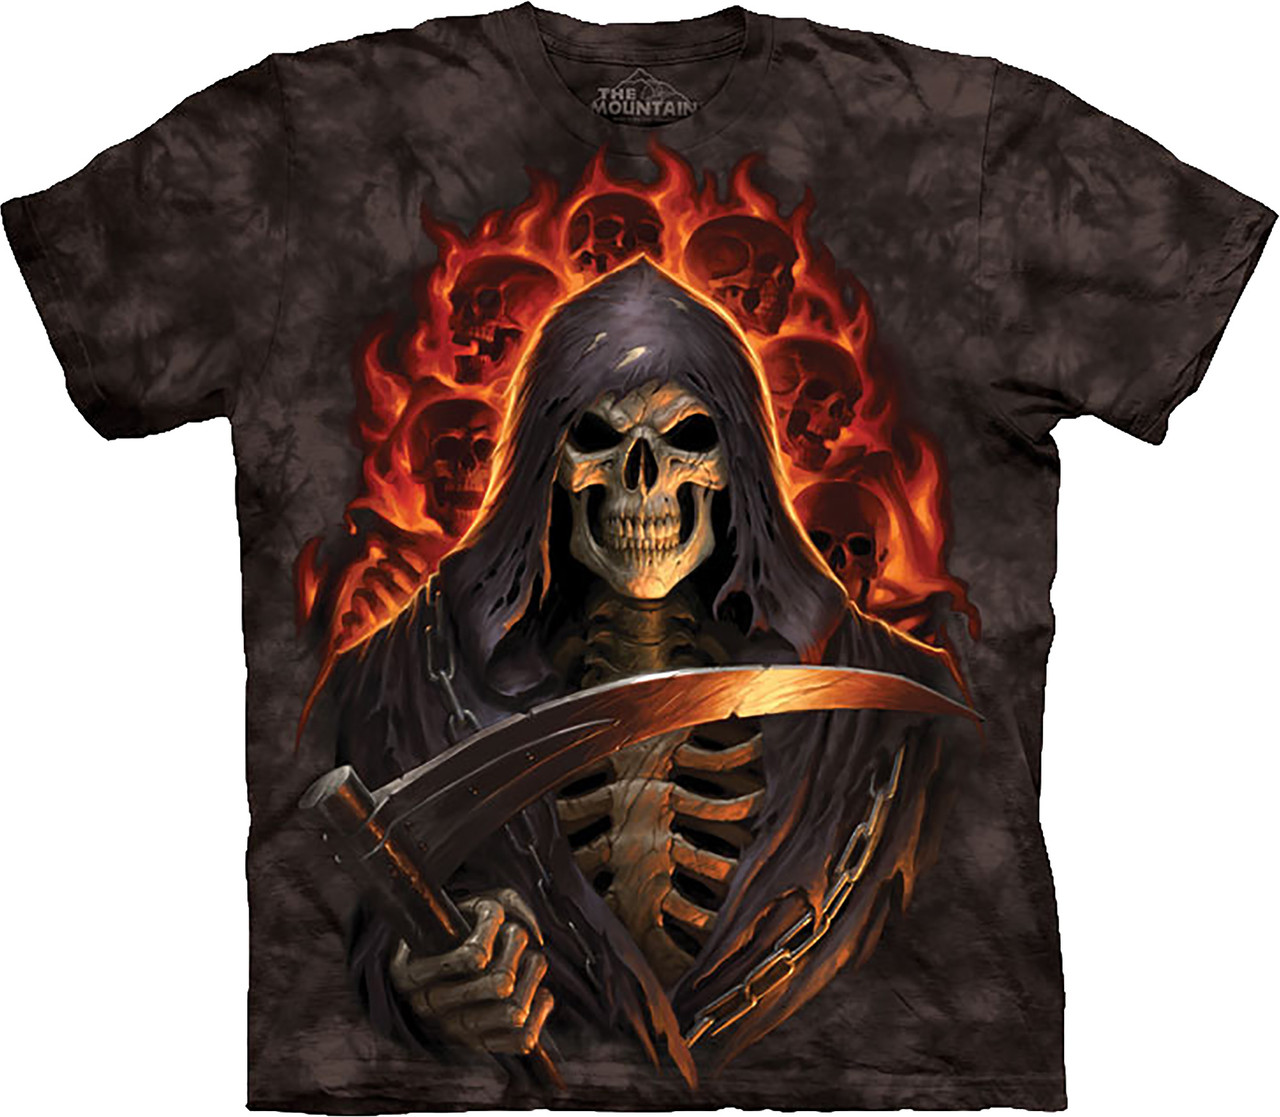 Футболка The Mountain - Fire Reaper